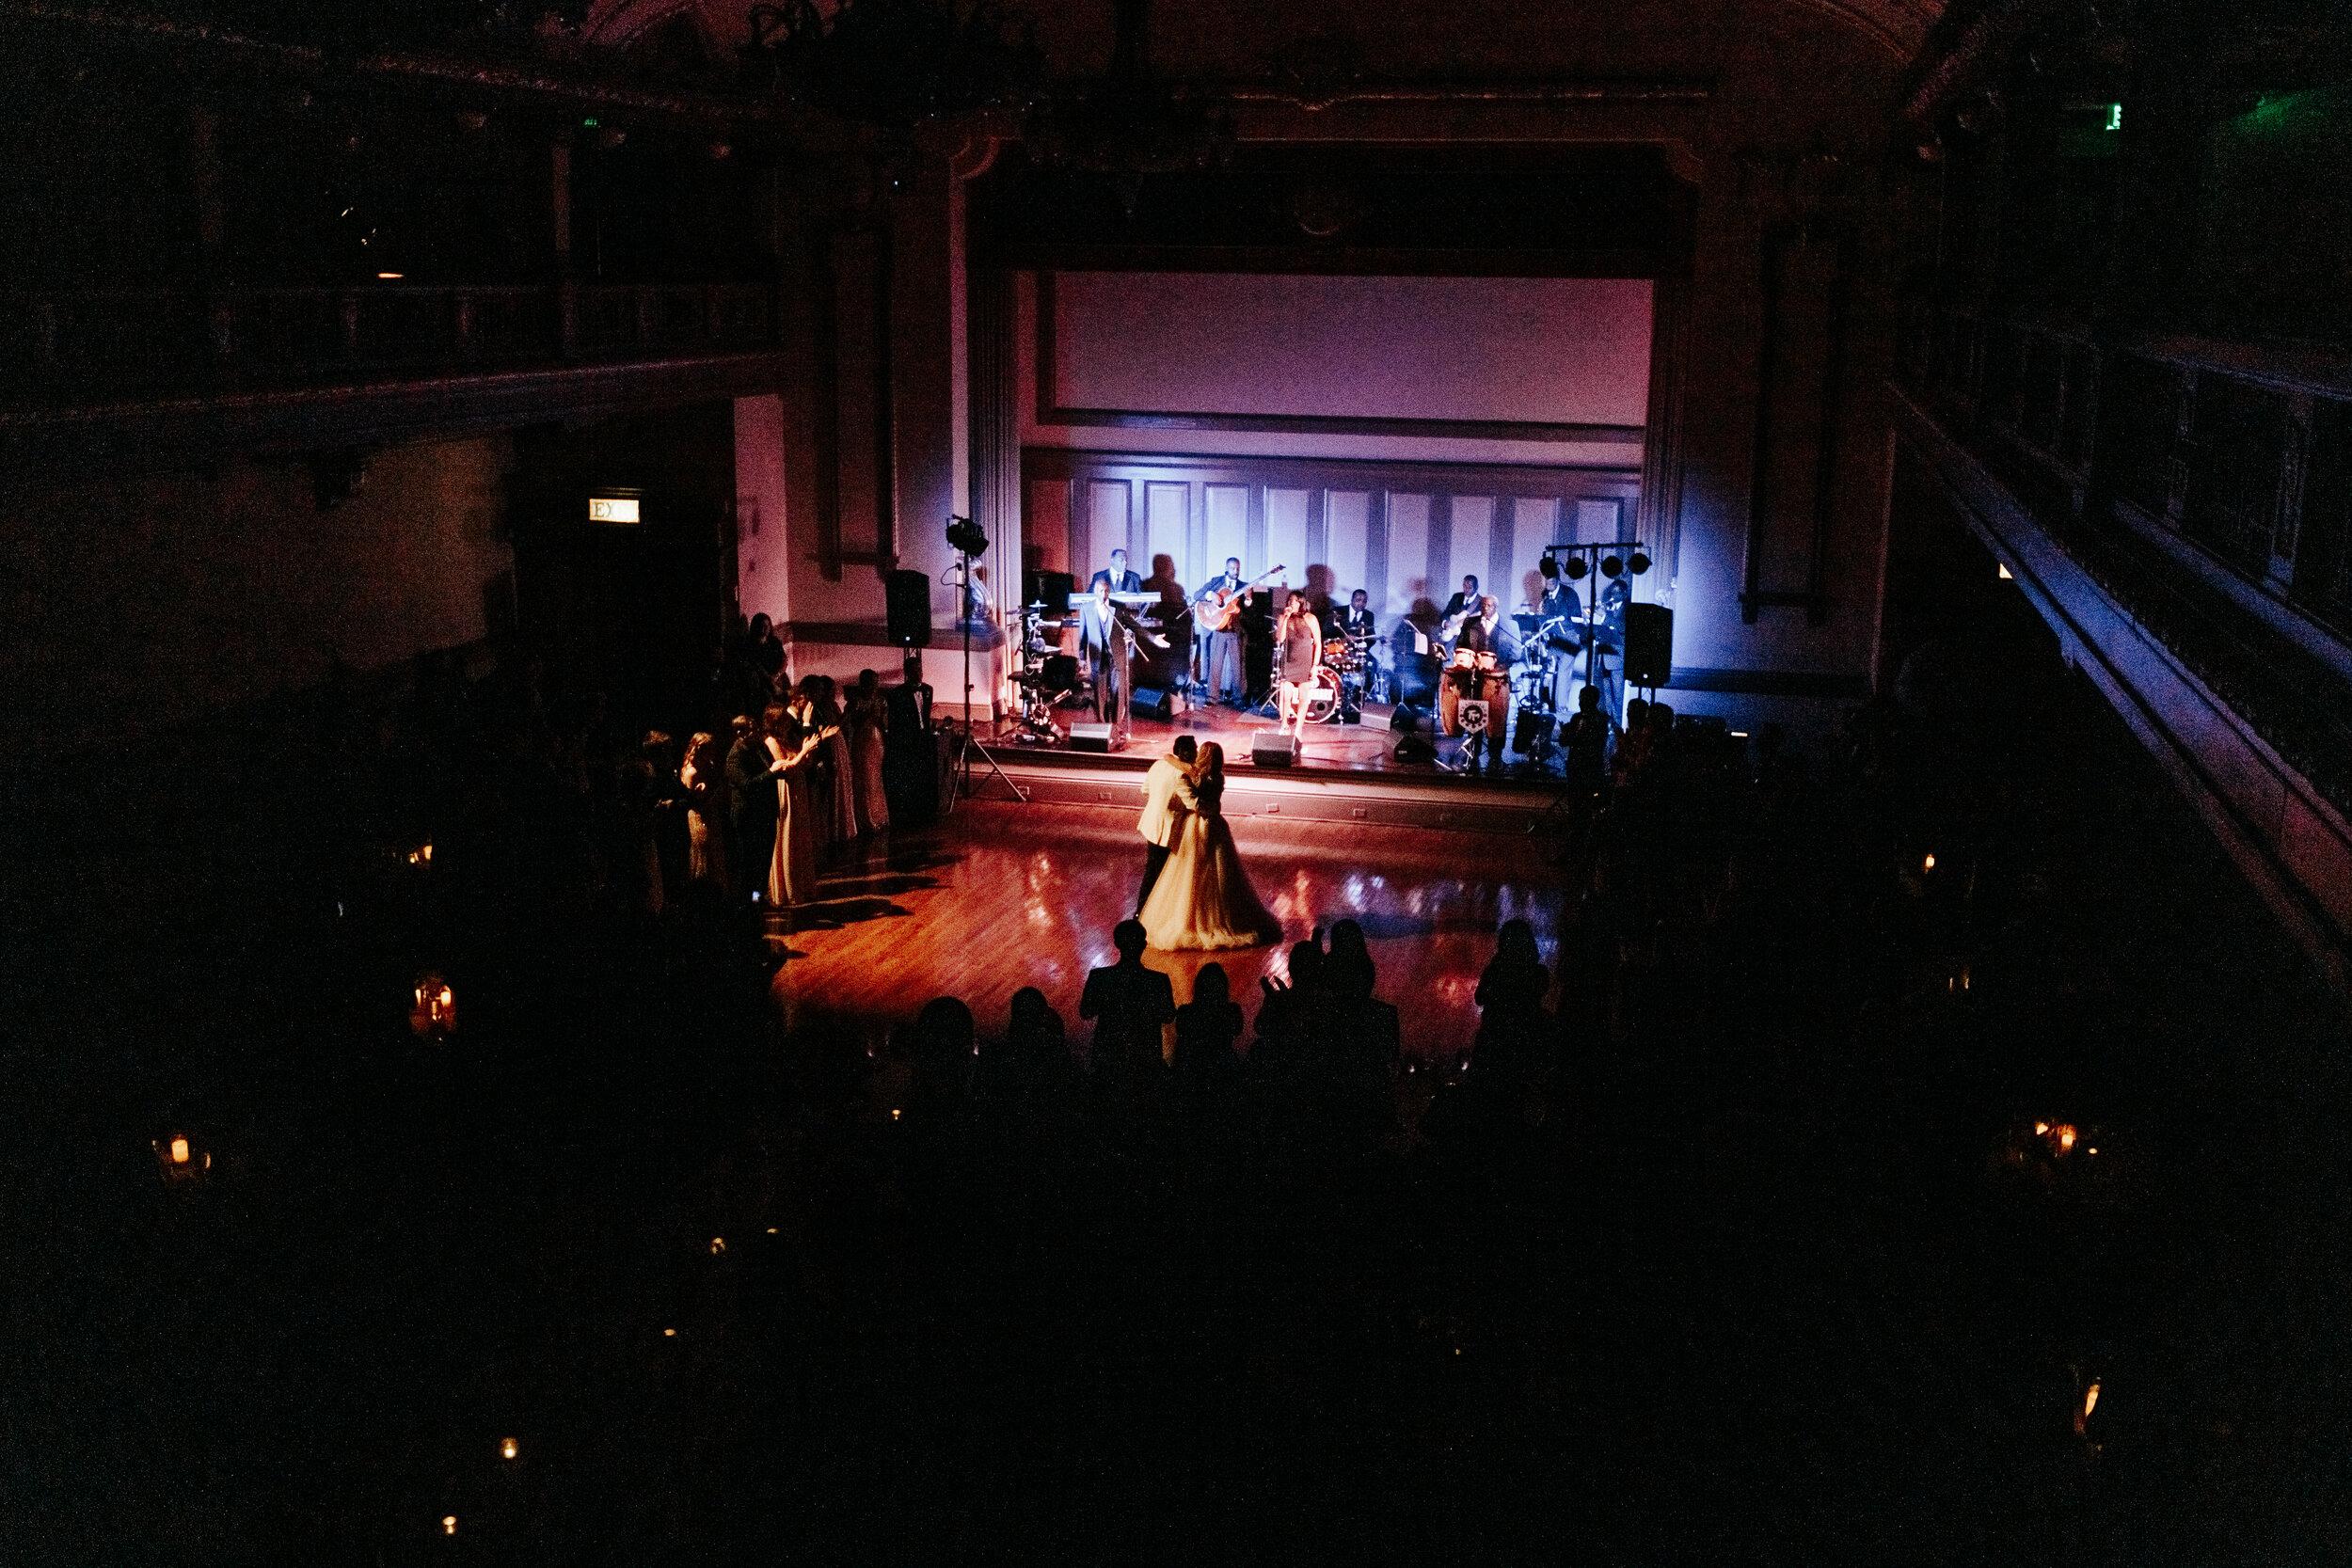 Cassie-Mrunal-Wedding-Quirk-Hotel-John-Marshall-Ballrooms-Richmond-Virginia-Photography-by-V-93.jpg